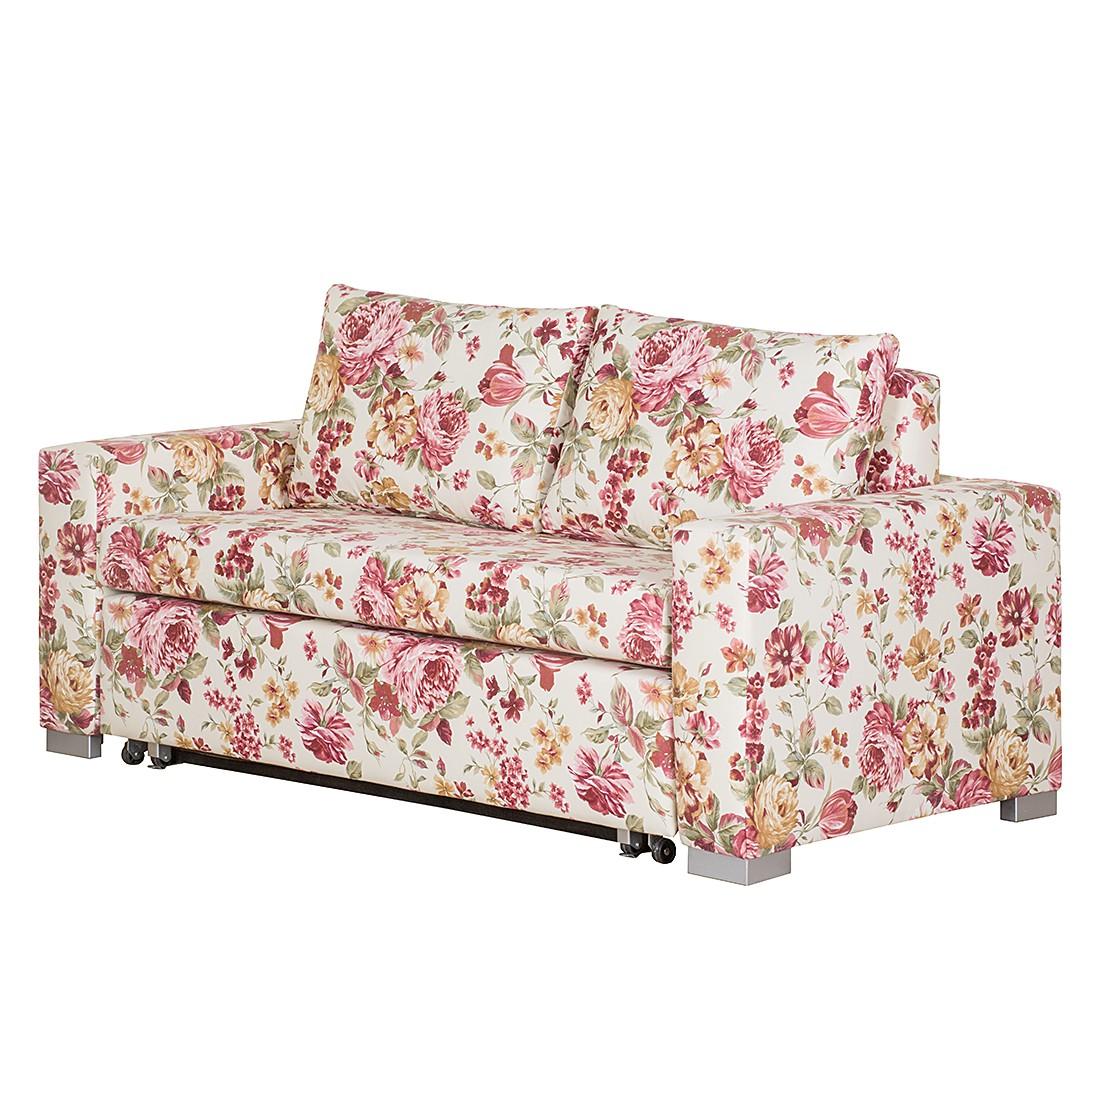 Schlafsofa Latina – Webstoff Beige/Pink geblümt – 185 cm, roomscape günstig bestellen